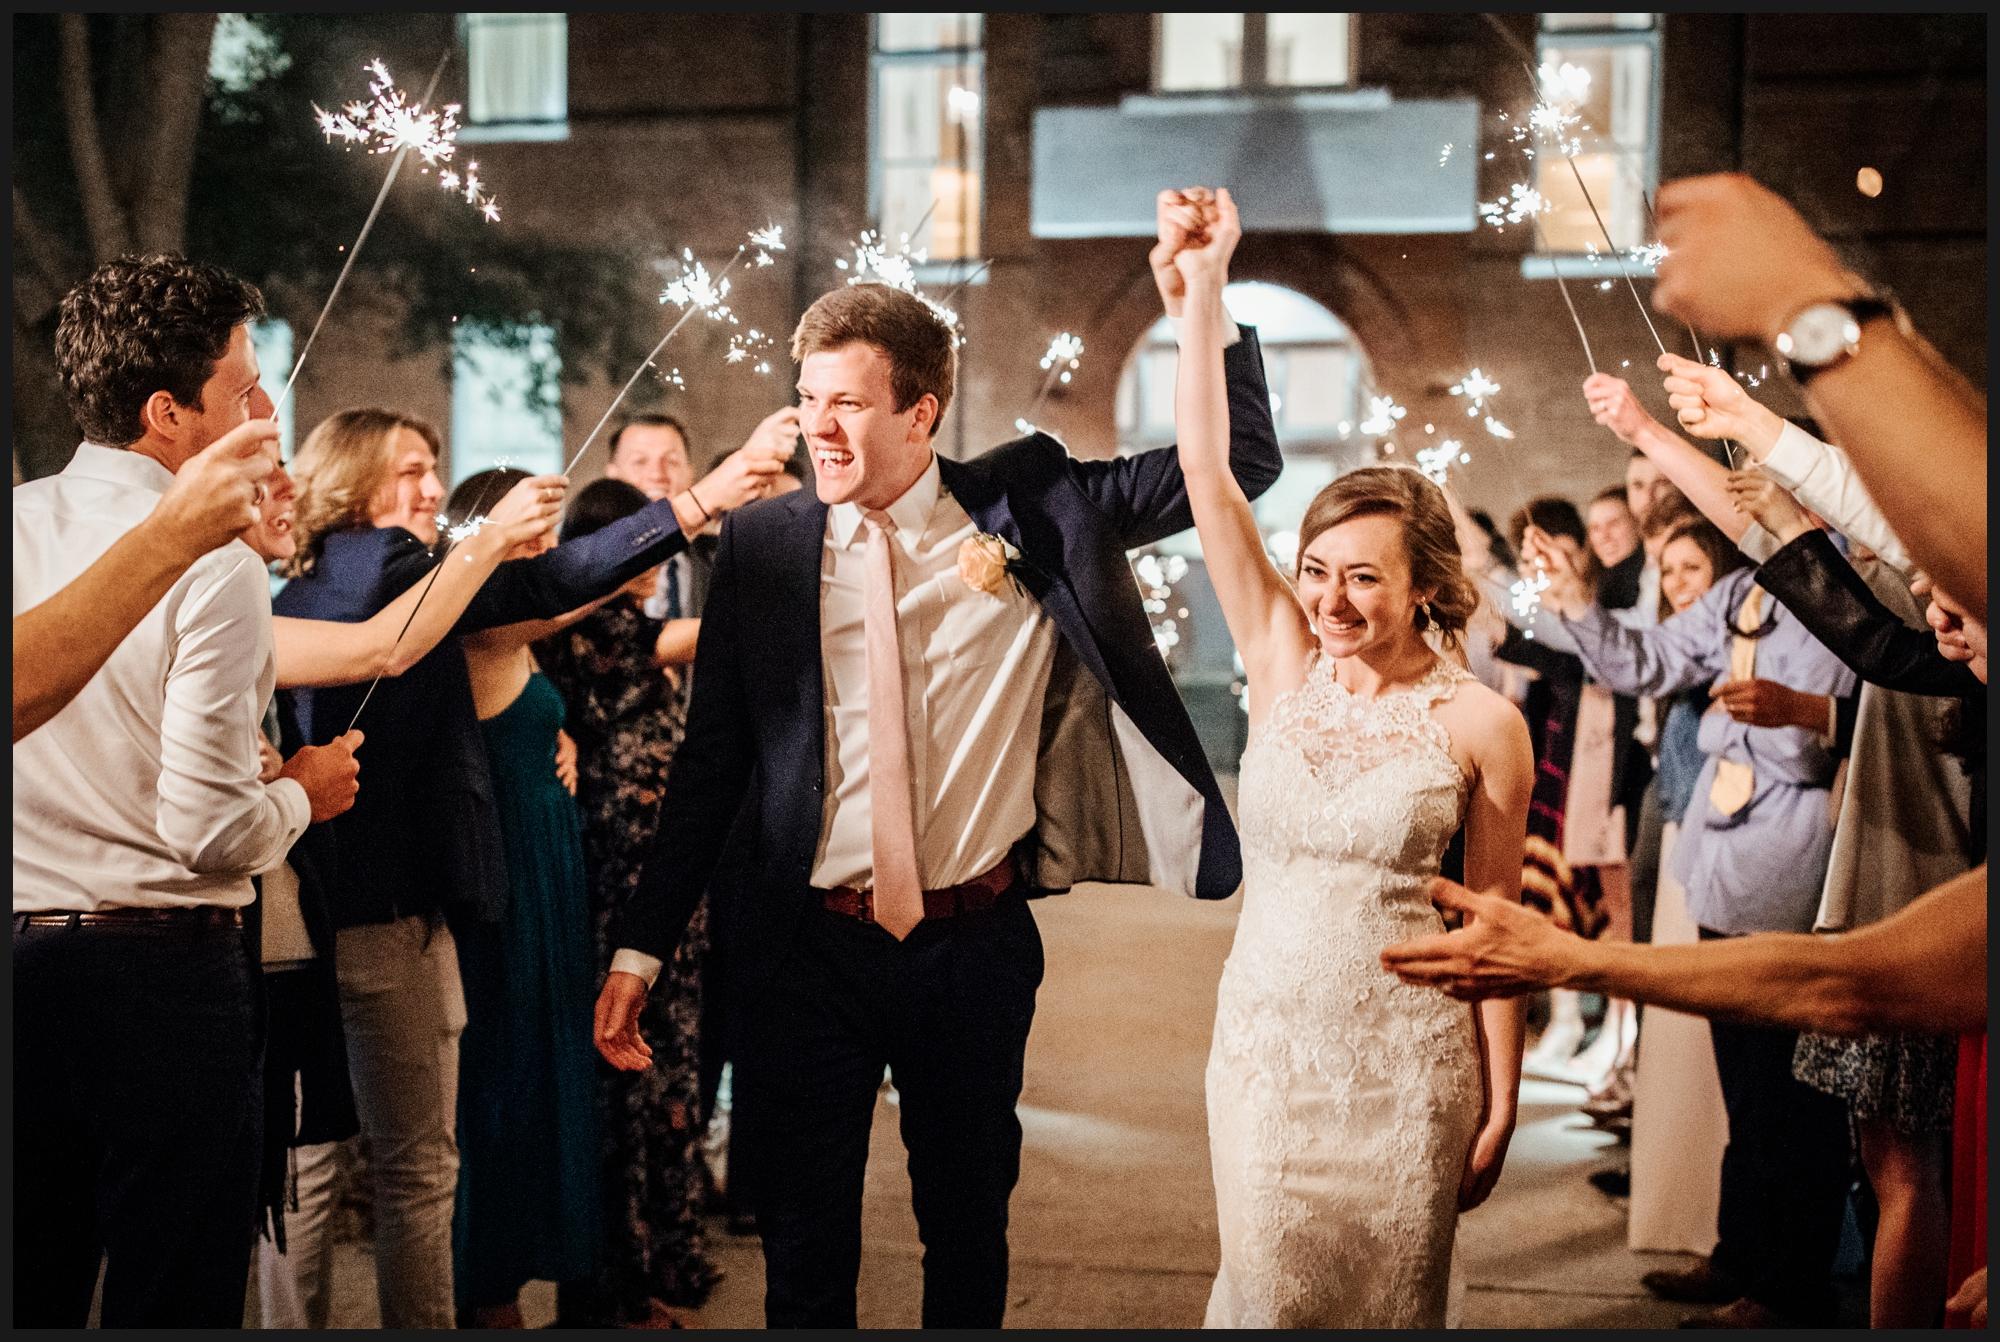 Orlando-Wedding-Photographer-destination-wedding-photographer-florida-wedding-photographer-bohemian-wedding-photographer_1788.jpg